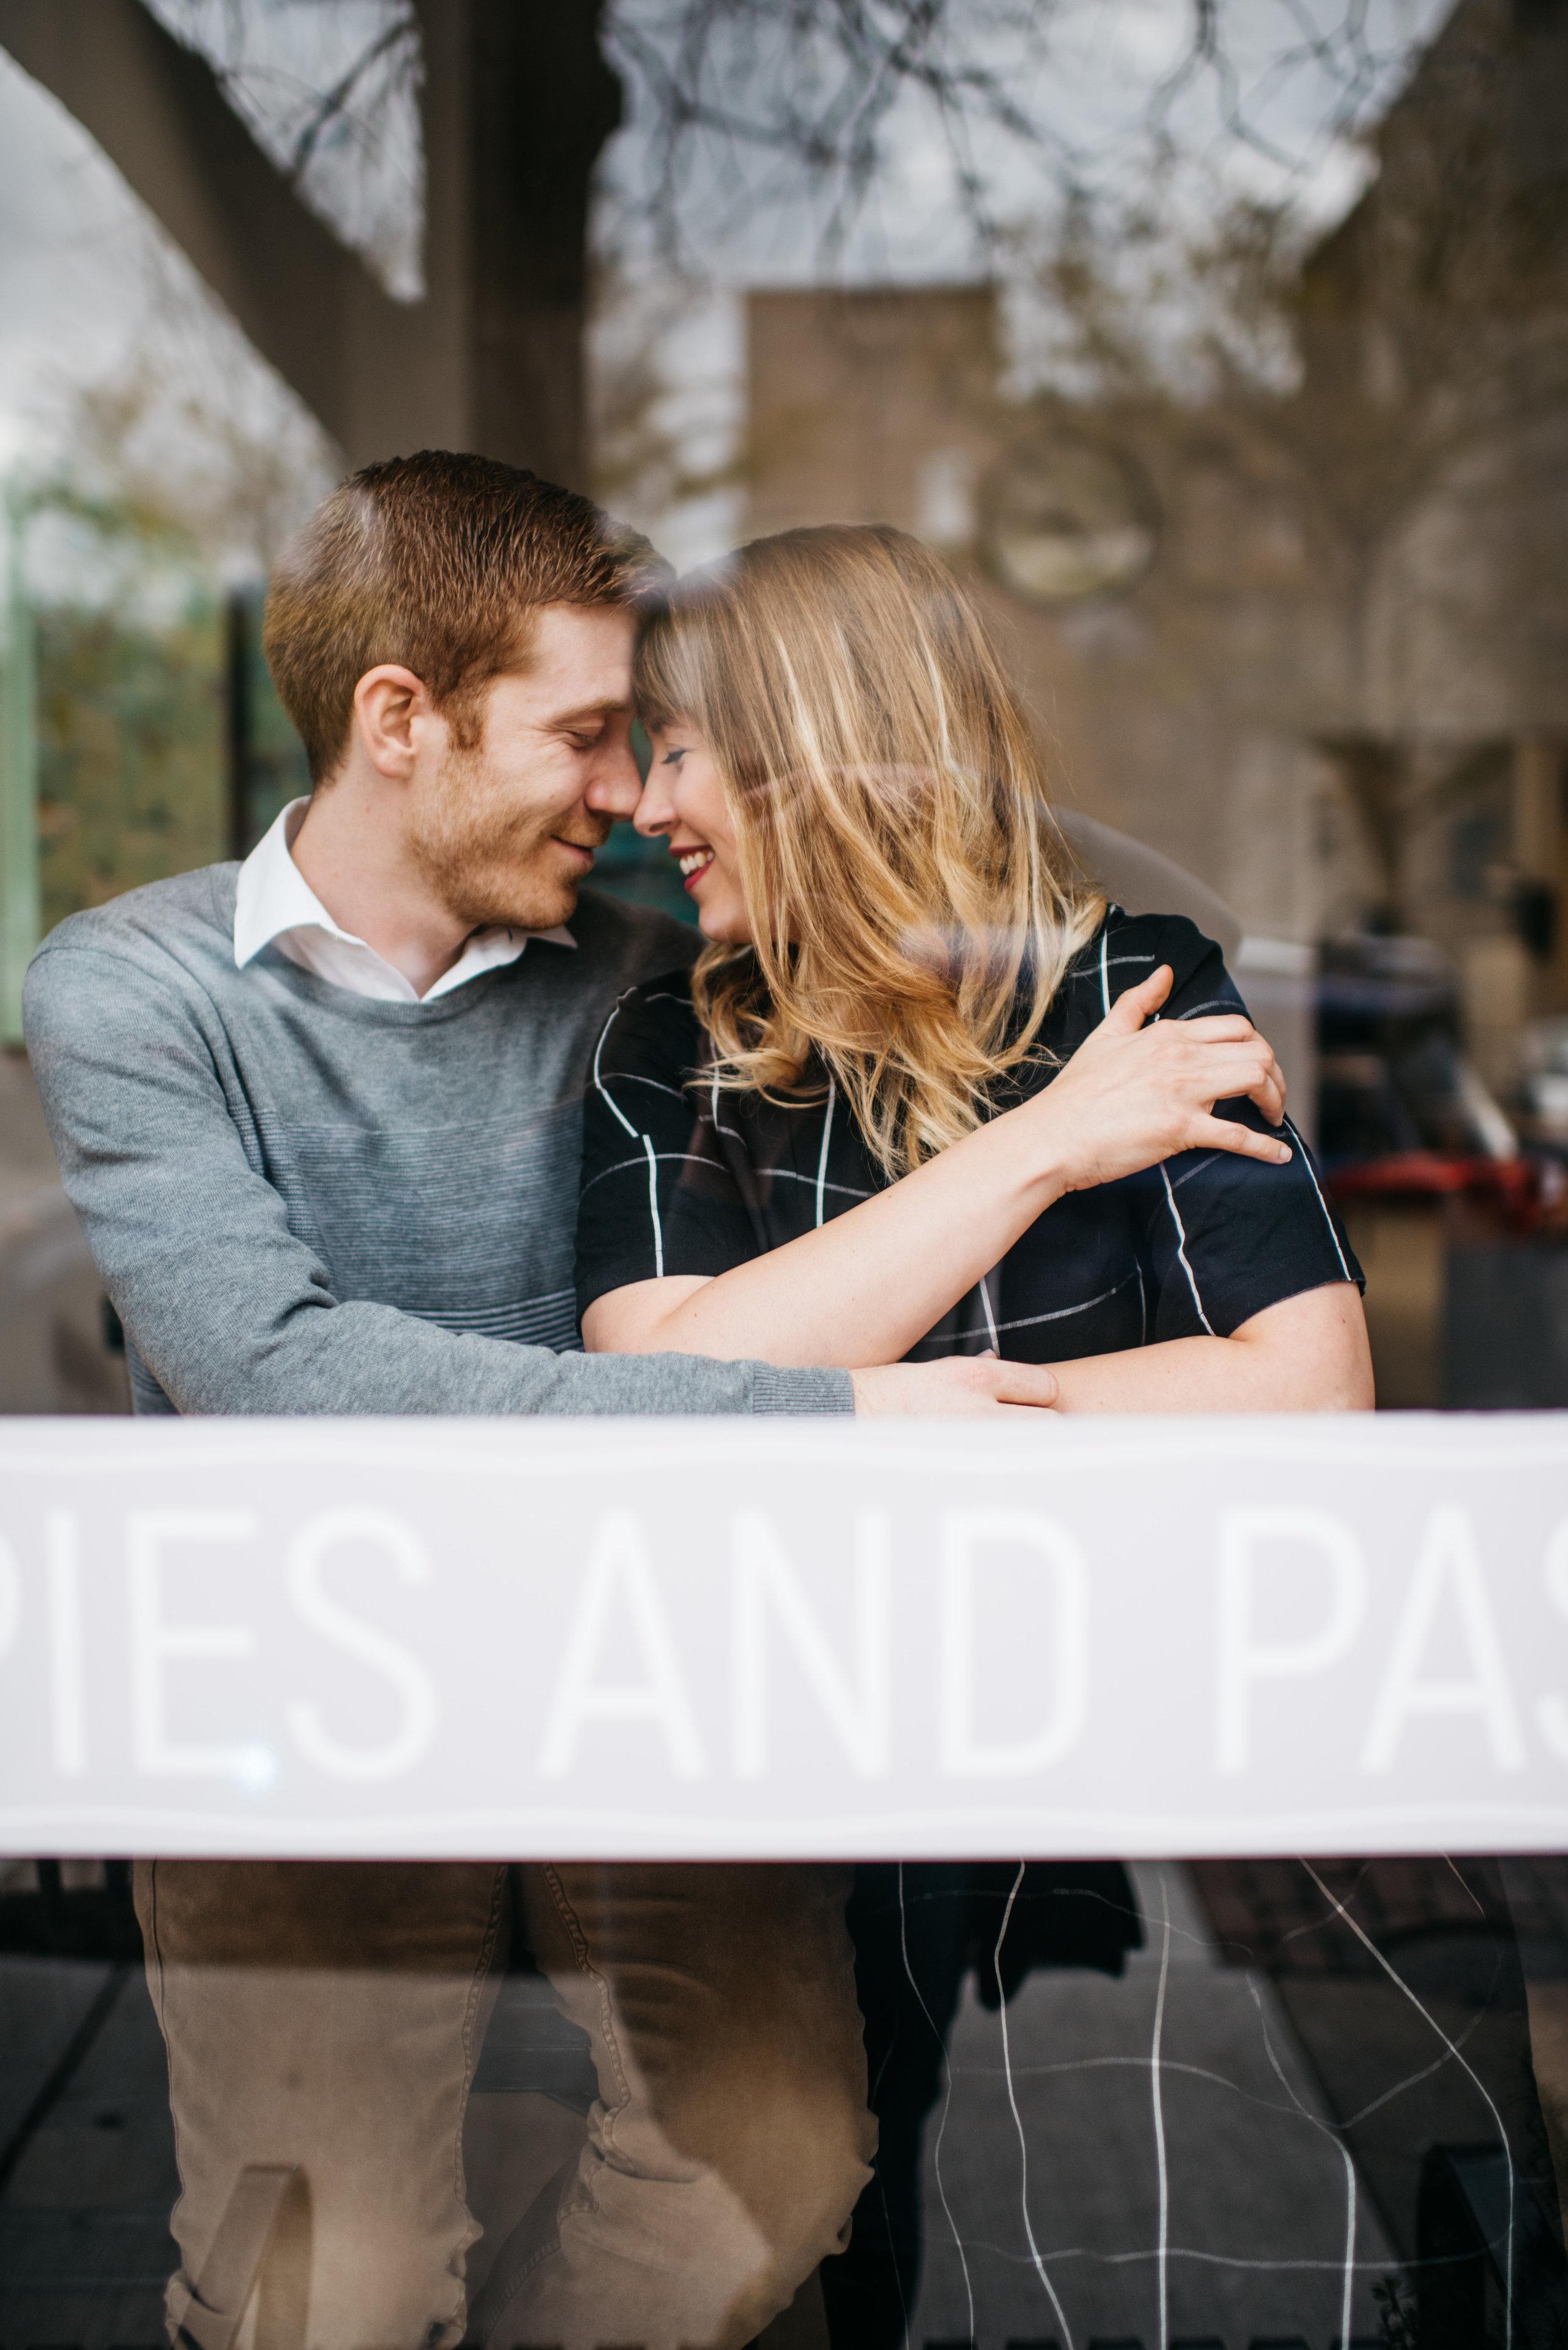 Modern Bakery Engagement Session Greenhouse Erika Aileen Photography Lafayette Indiana Wedding Photographer